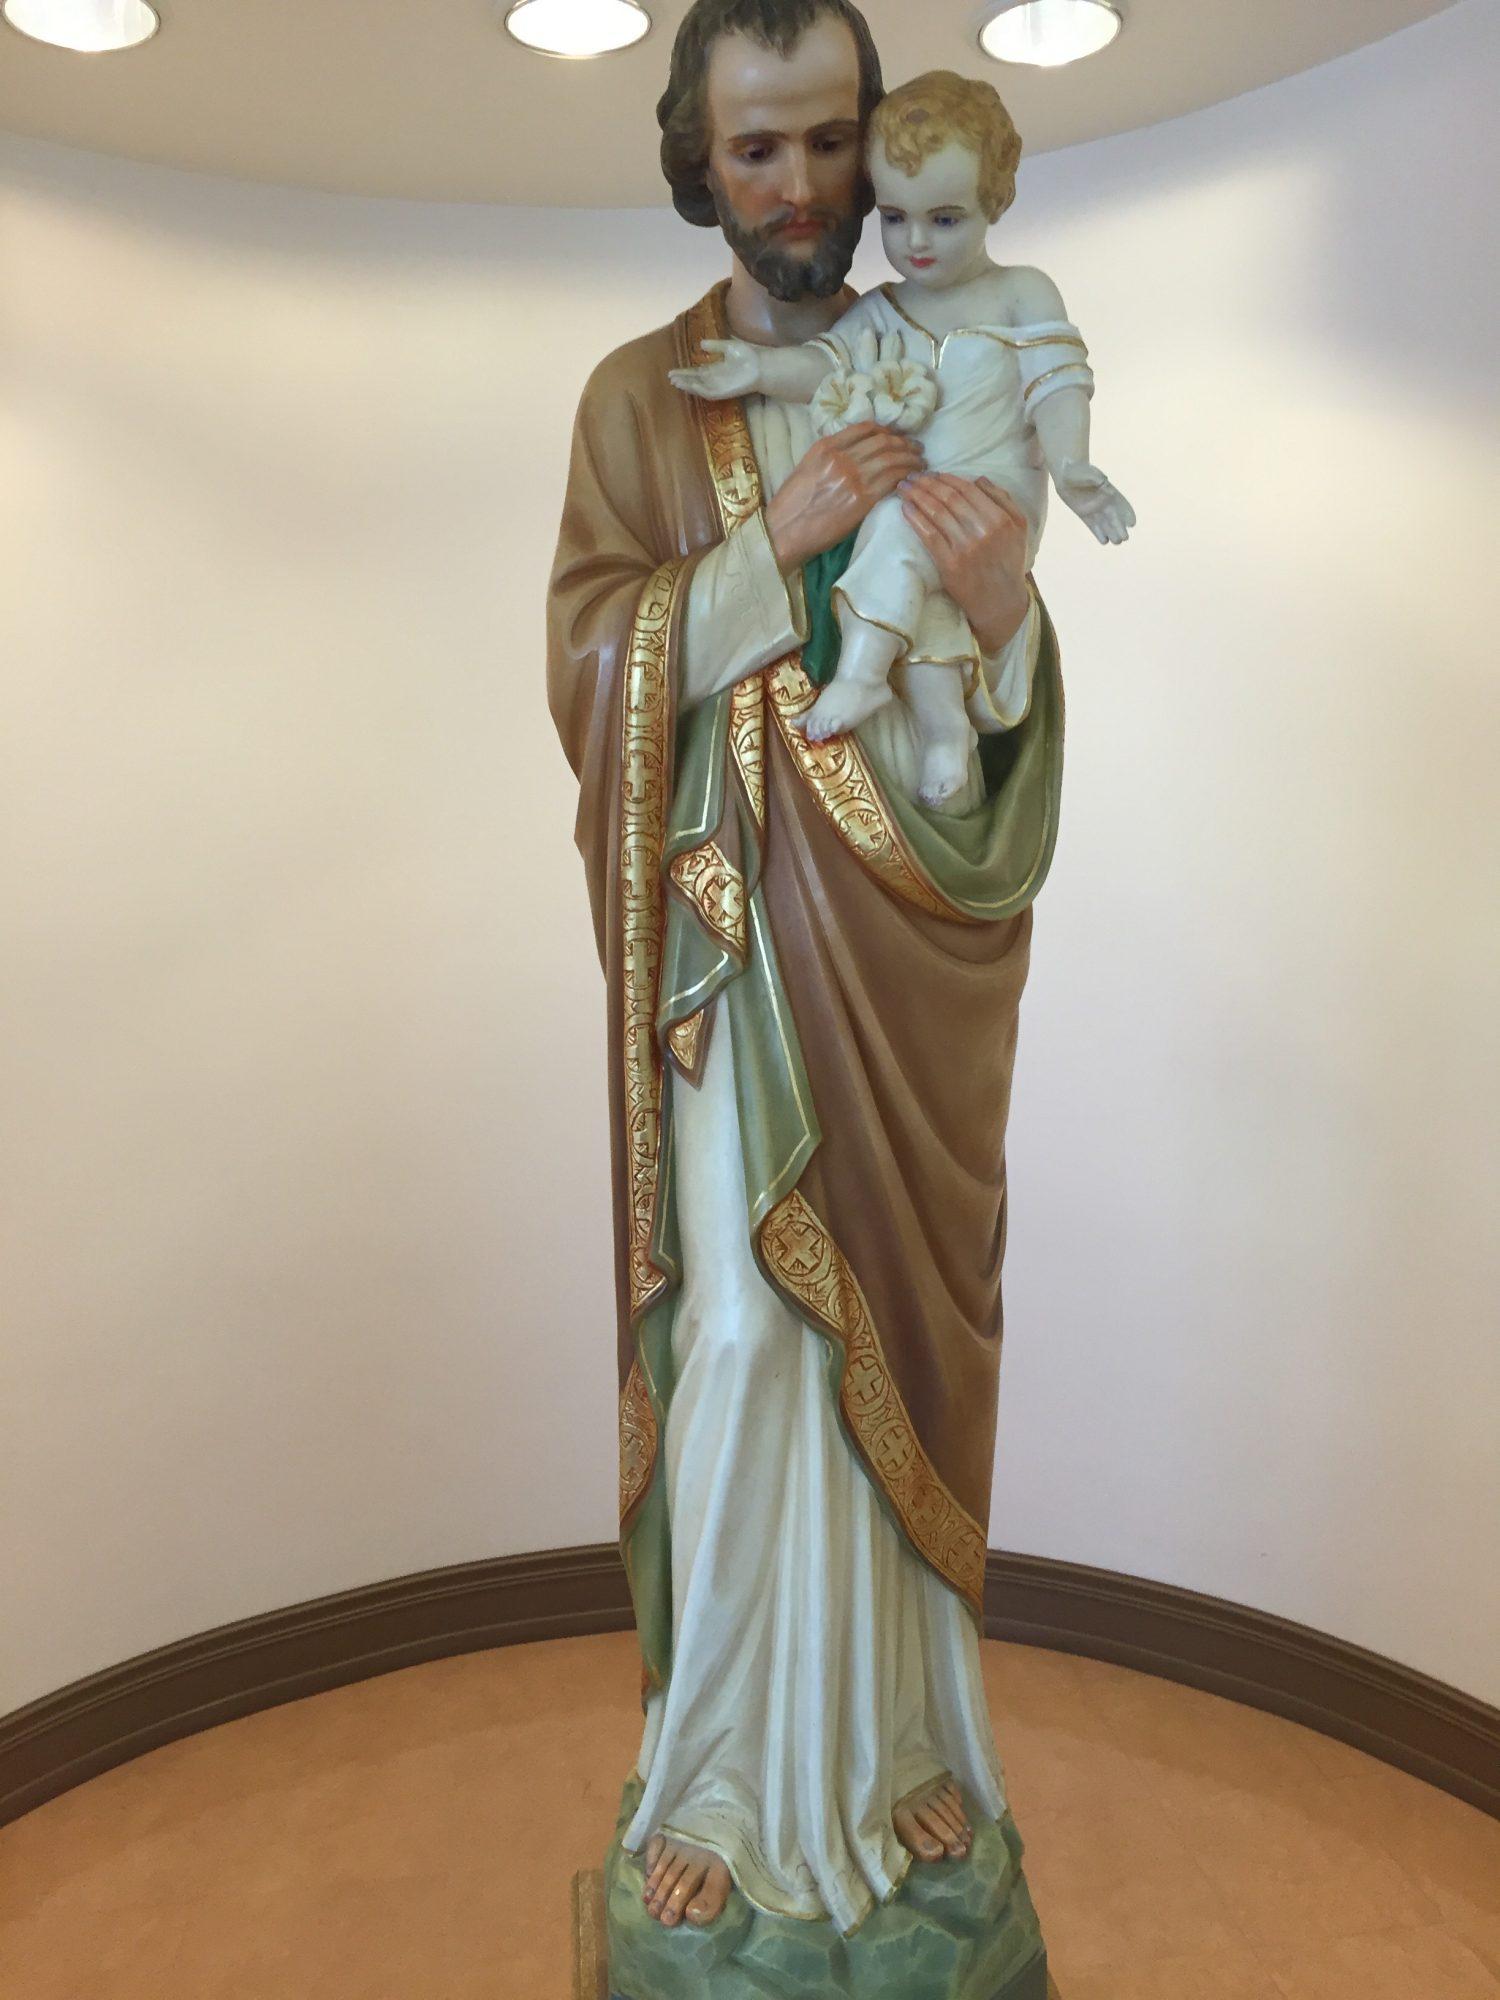 STATUE OF white Jesus